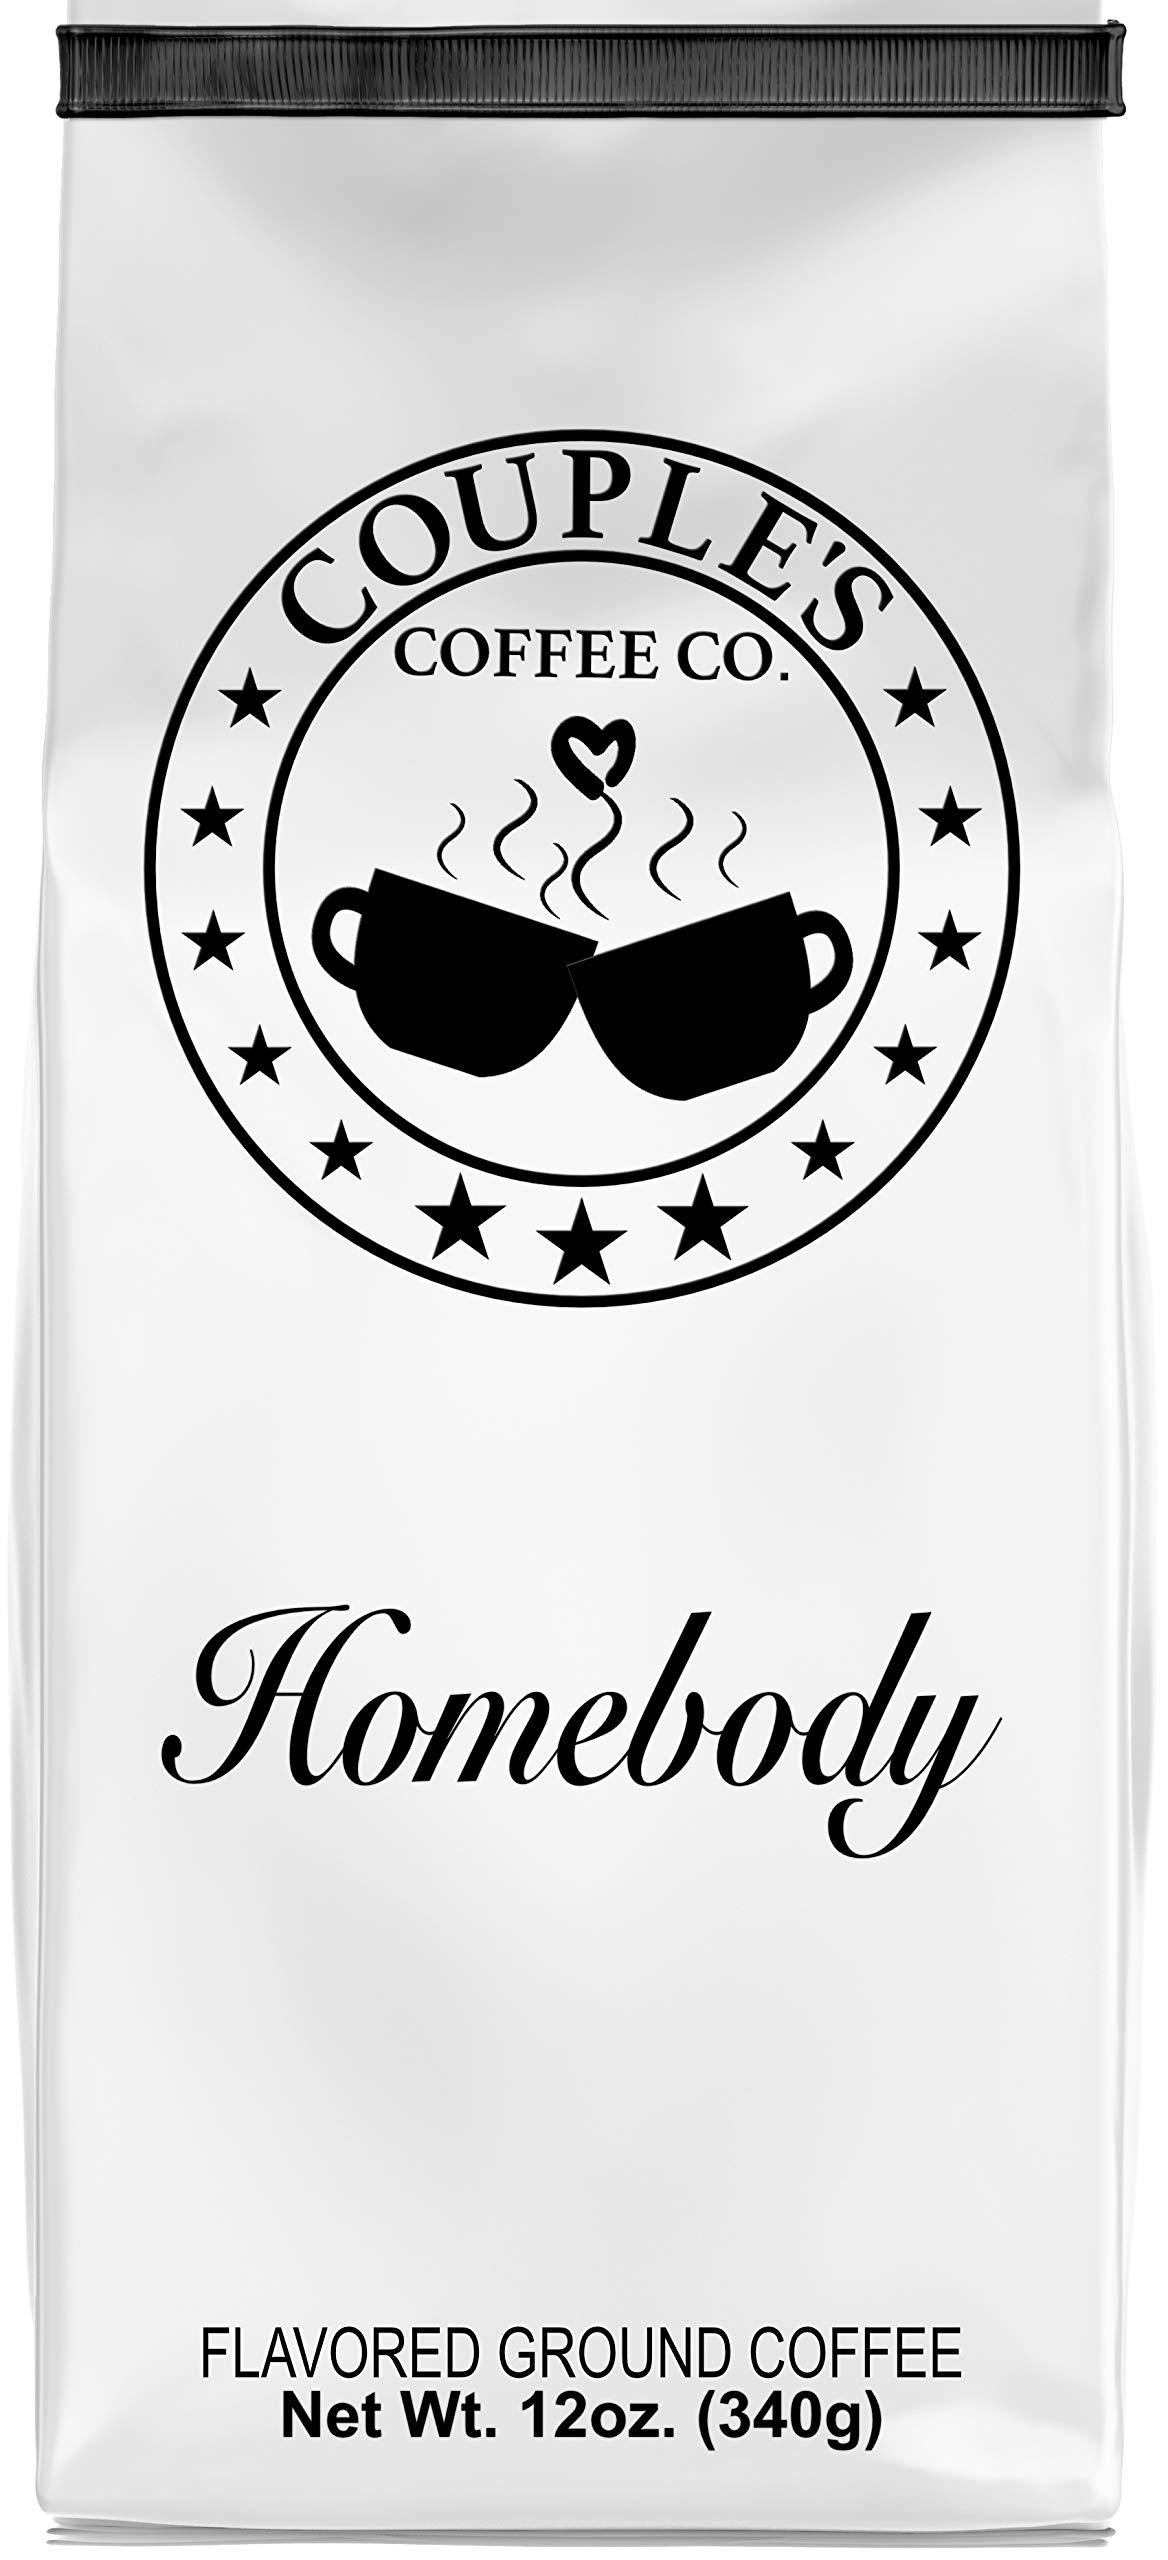 Couple's Coffee Co. Ground Coffee,''Homebody'', 12 oz